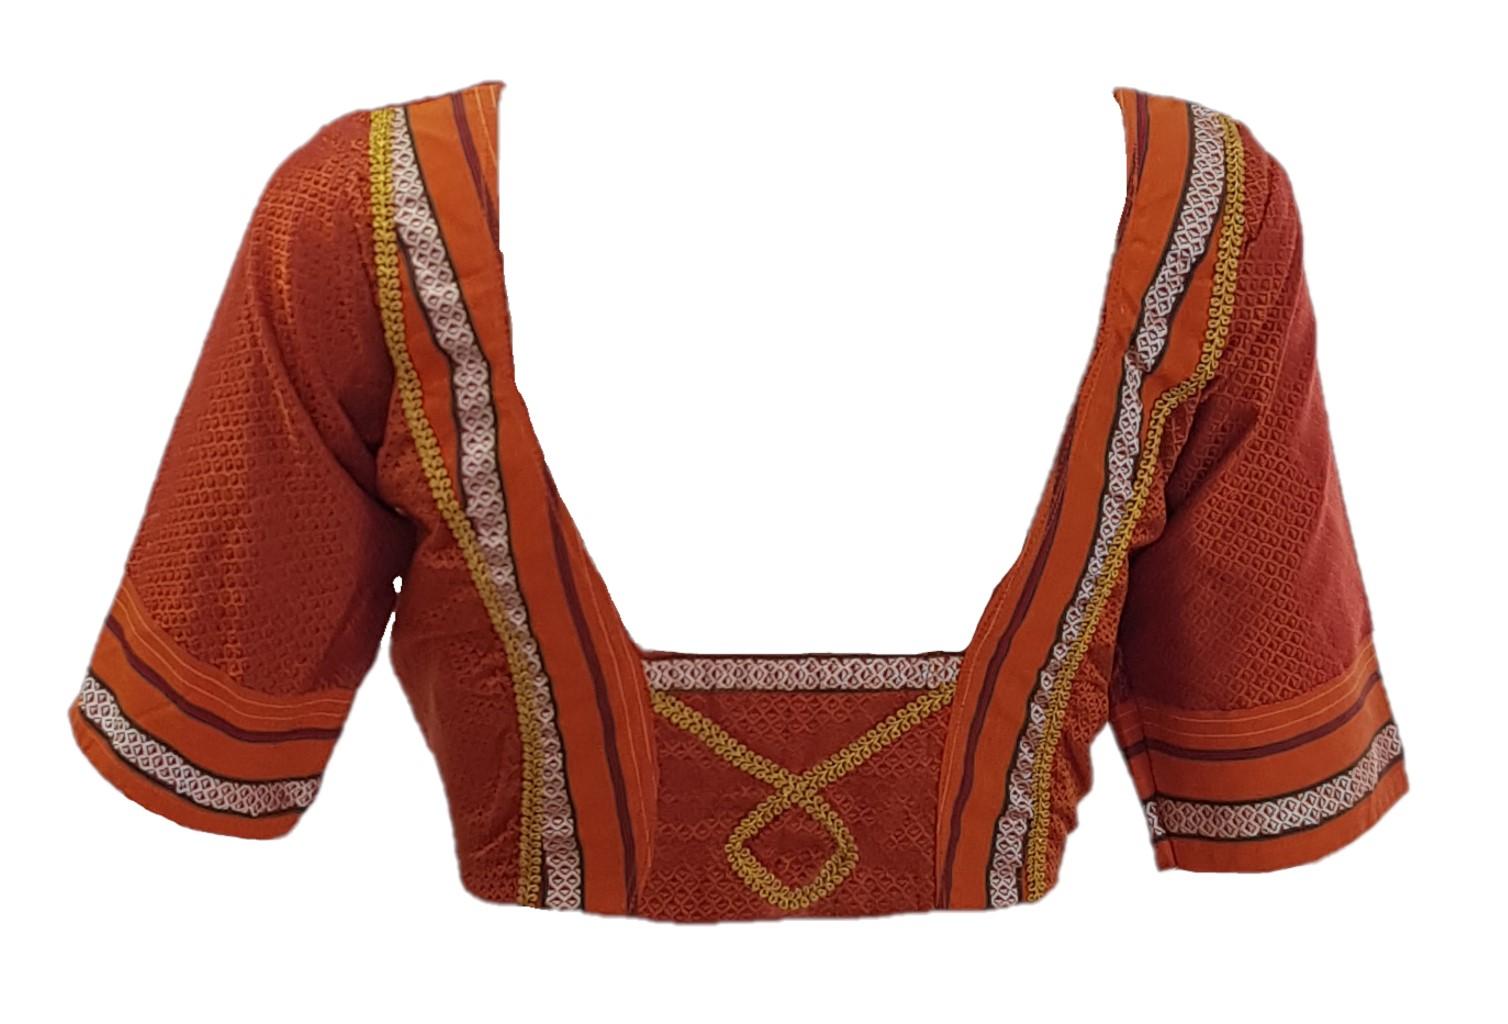 Ilkal Cotton Silk Khun Fabric Designer Back Readymade Saree Blouse Copper Orange Size Medium : Picture